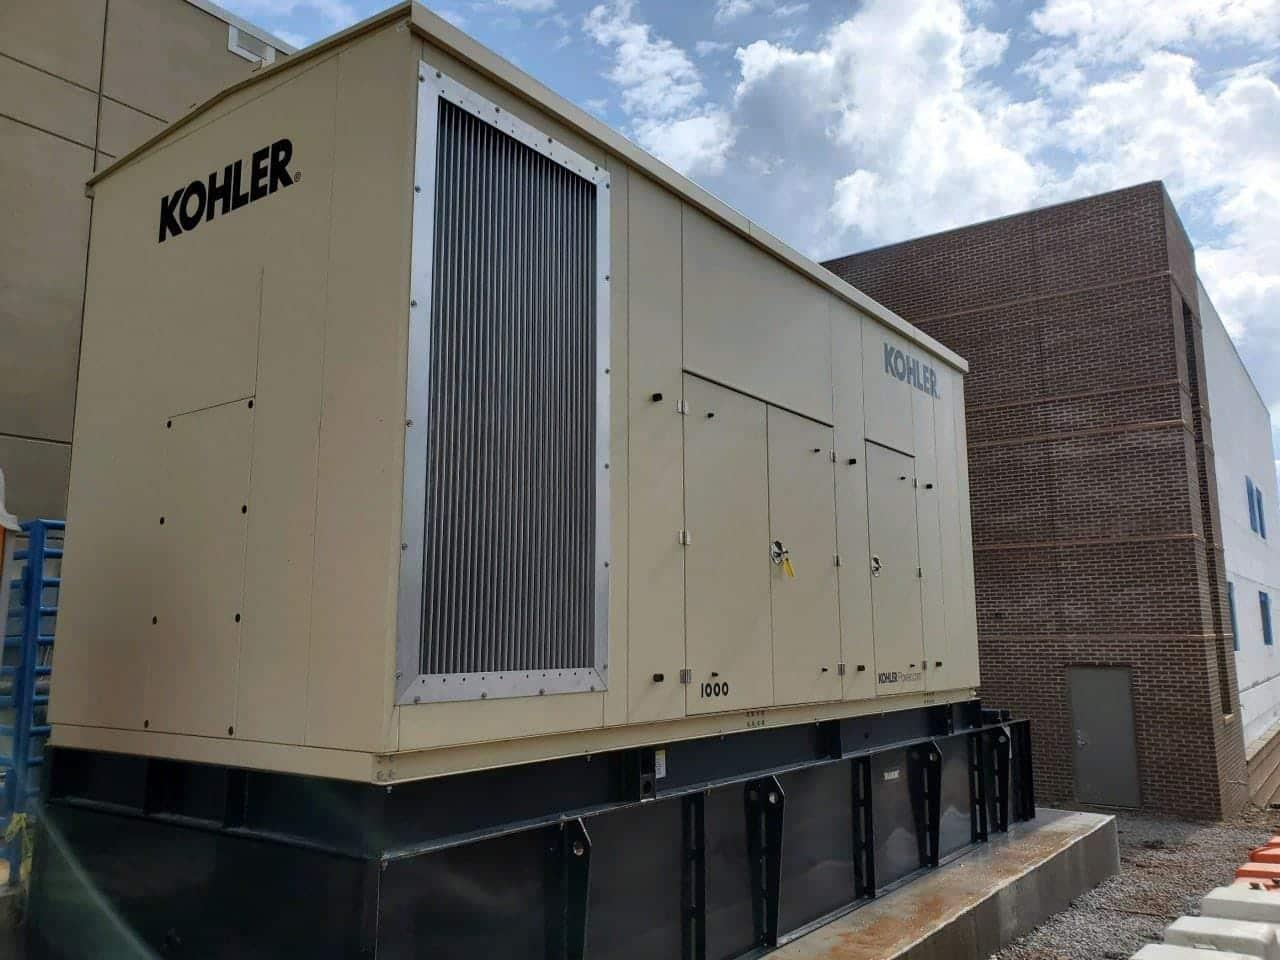 New 1000 kW Kohler KD1000 Diesel Generator – EPA Tier 2 – SOLD!